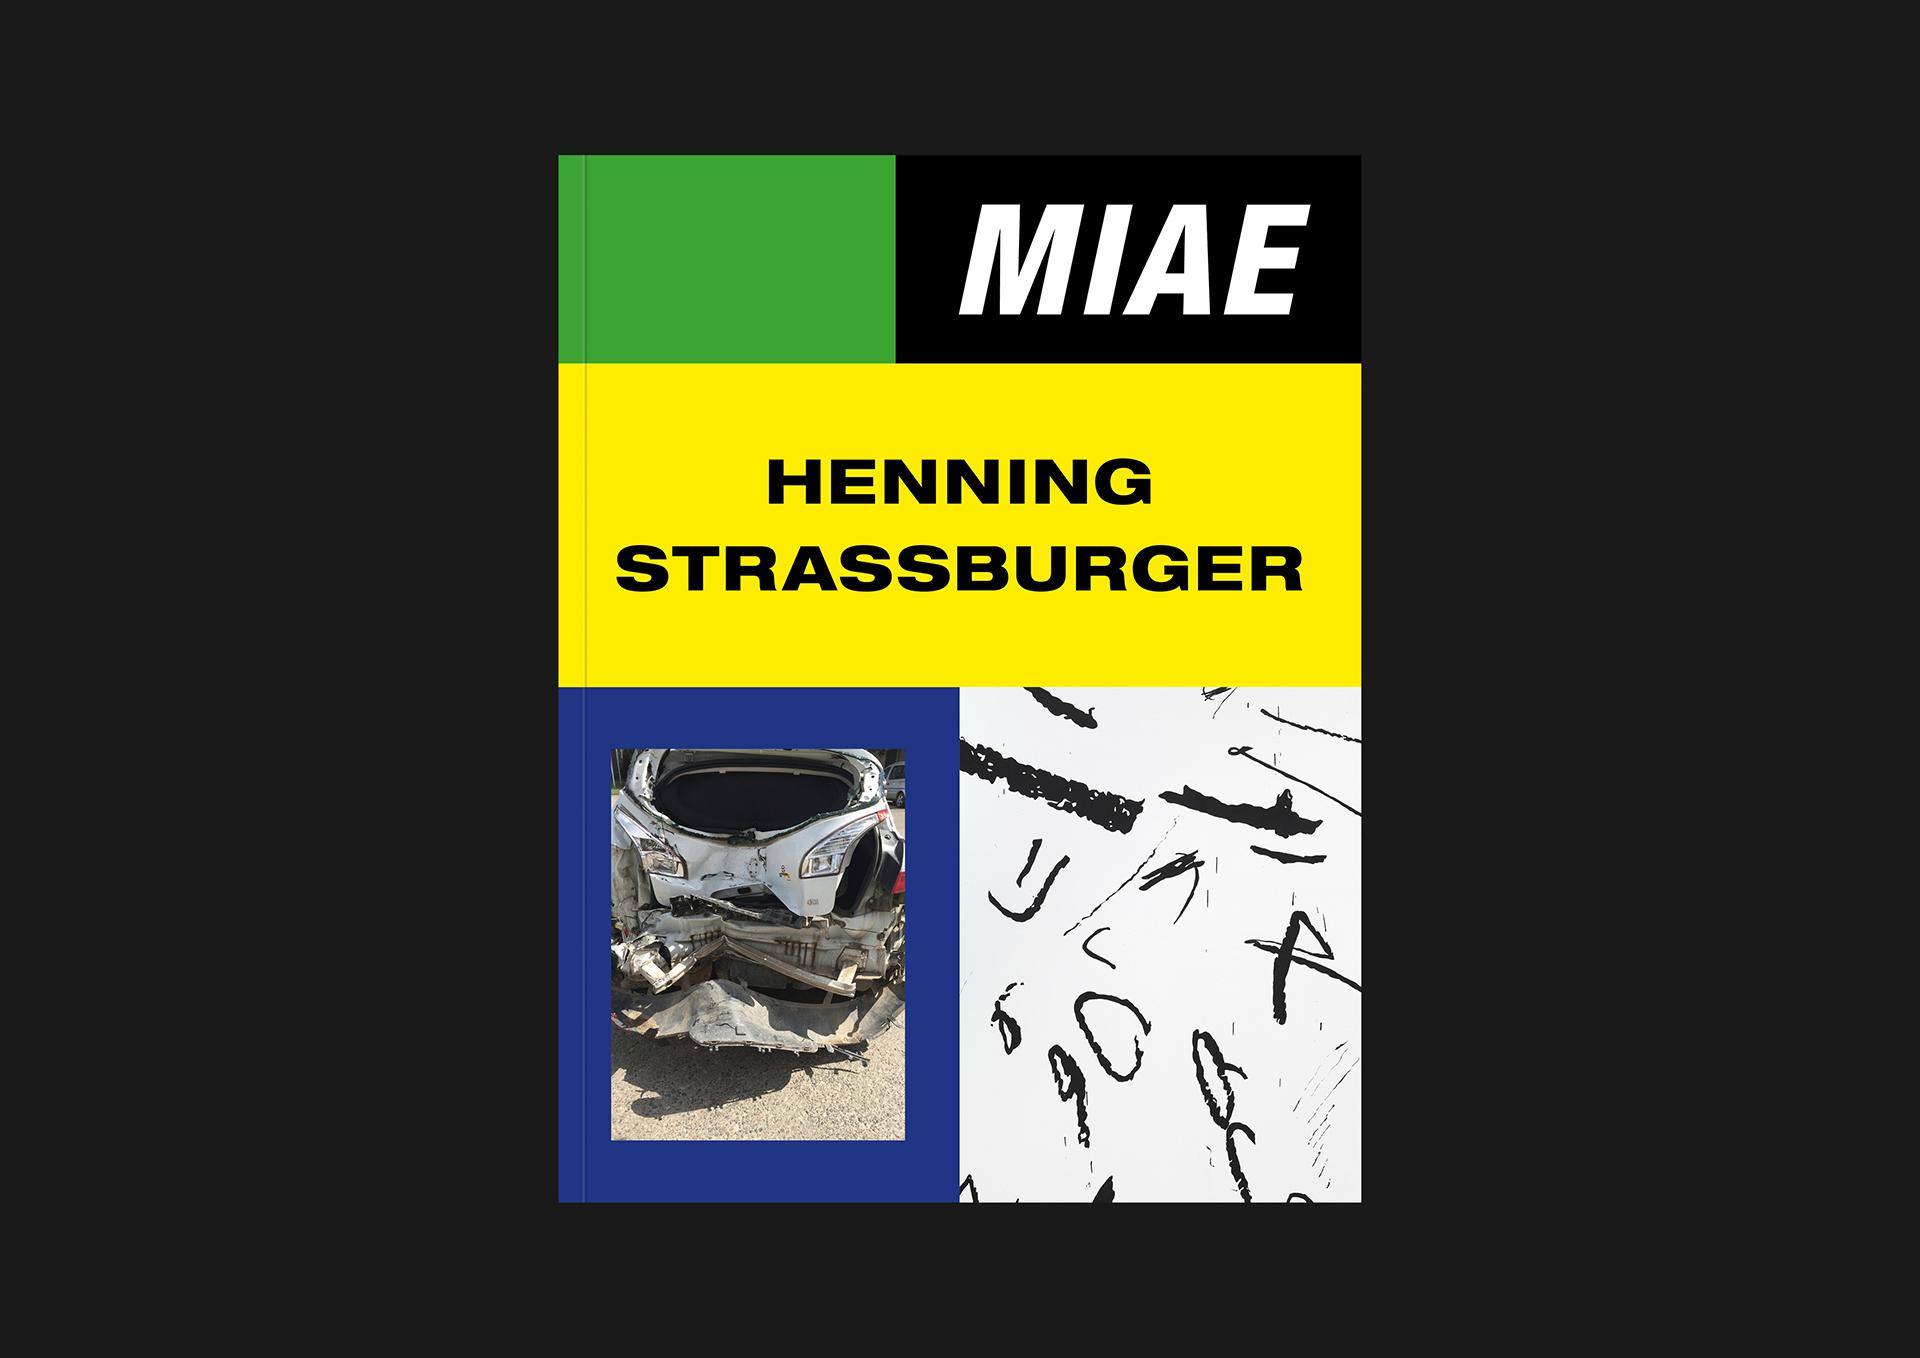 Henning Strassburger MIAE